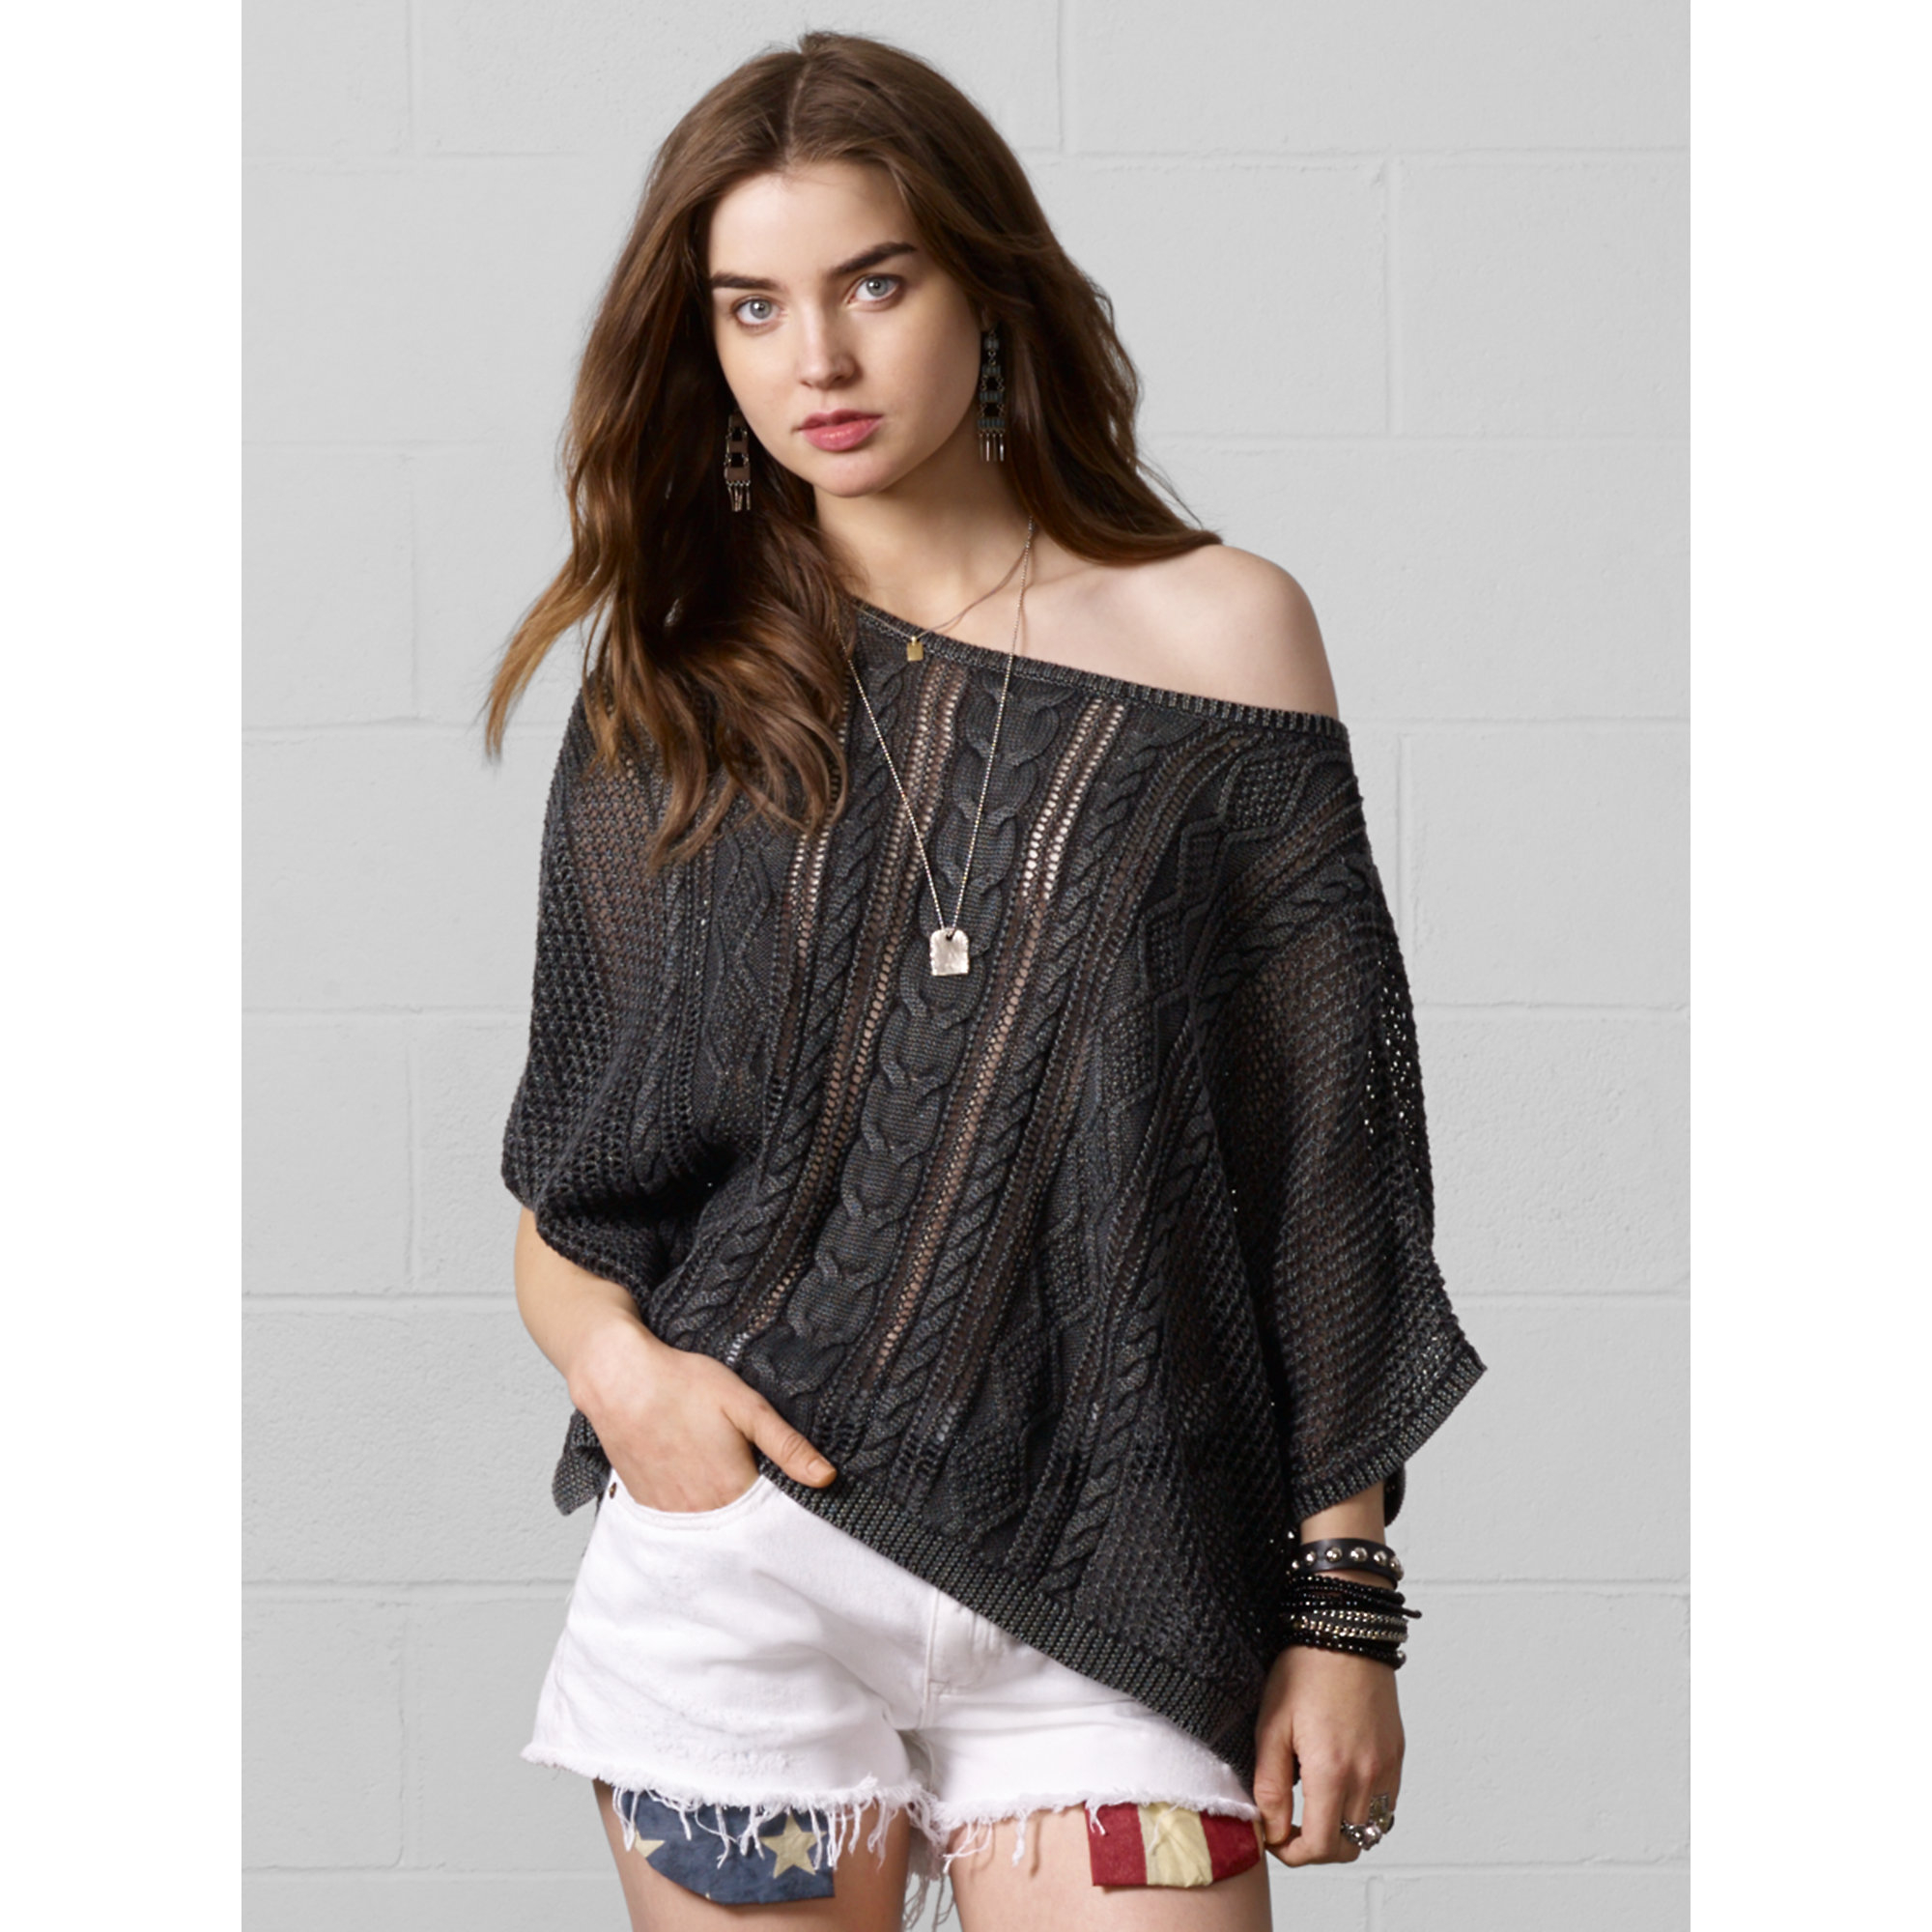 denim supply ralph lauren cable knit pullover sweater in black black wash lyst. Black Bedroom Furniture Sets. Home Design Ideas